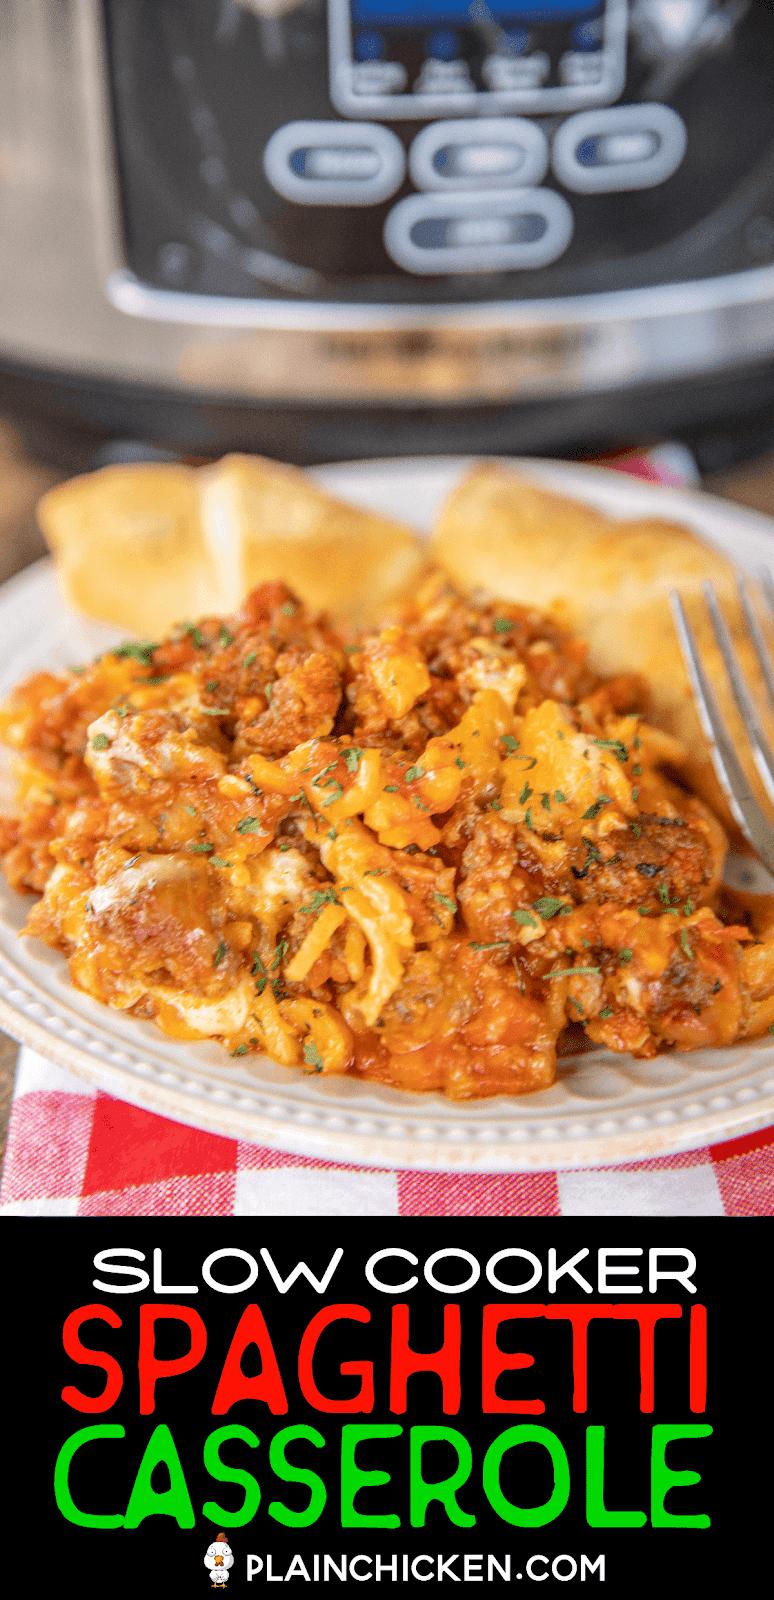 spaghetti casserole on a plate